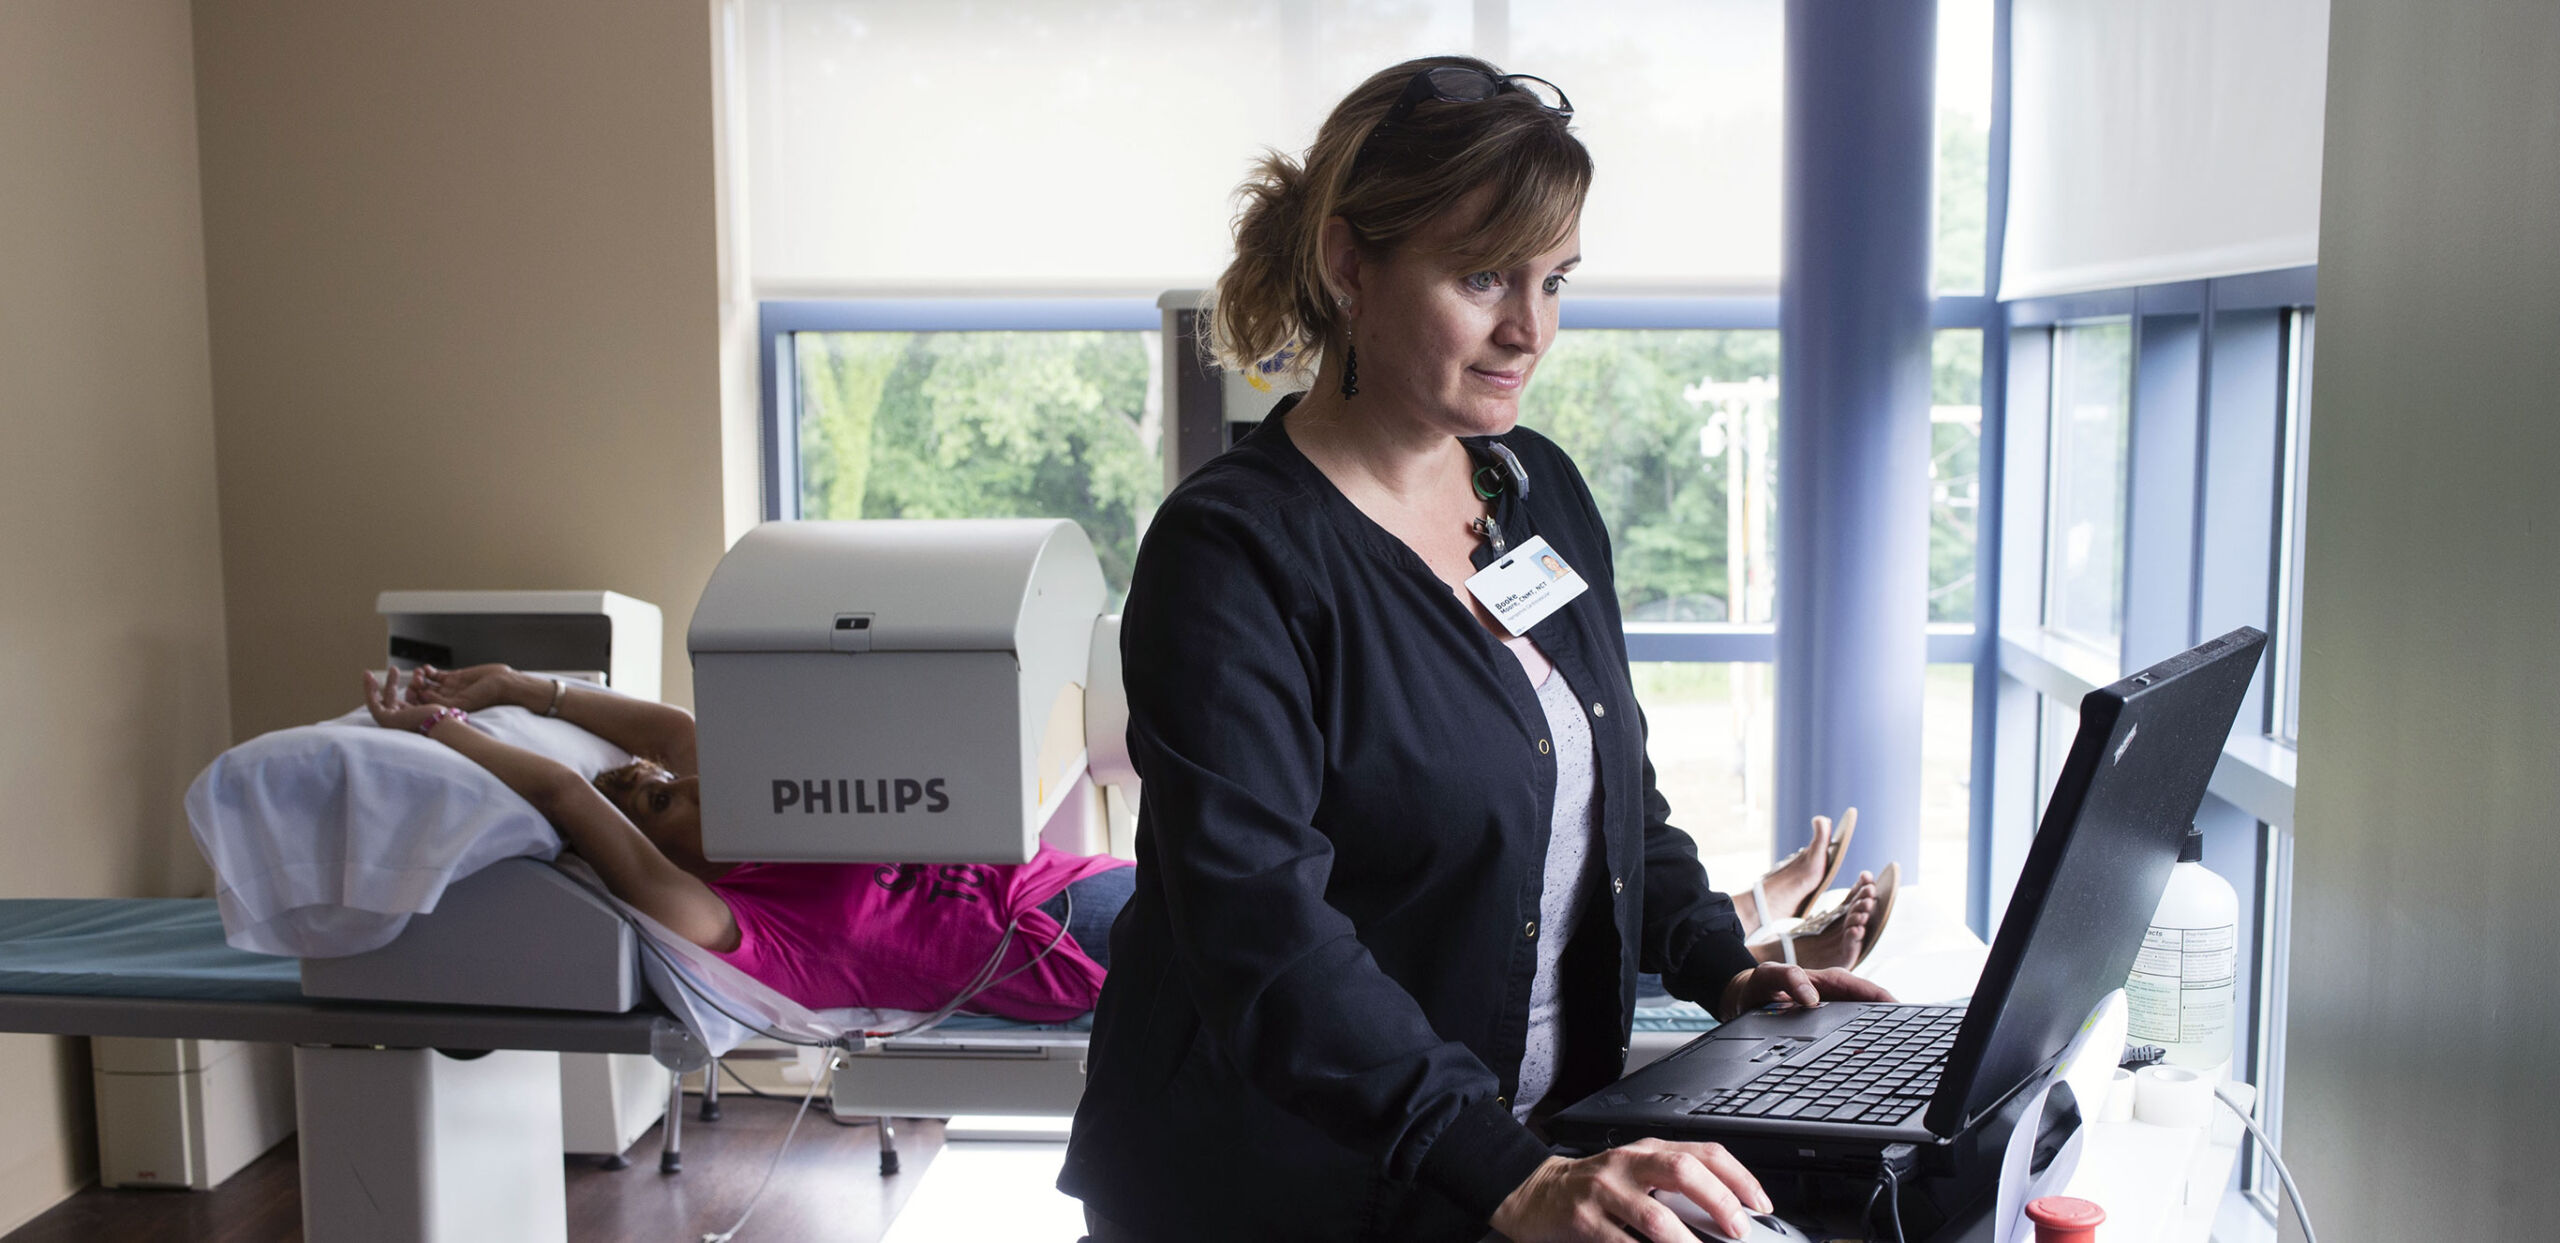 Nuclear Medicine Technologist Brooke Moore monitors a patient during a procedure at Hampshire Cardiovascular Associates, Northampton, MA 01060.